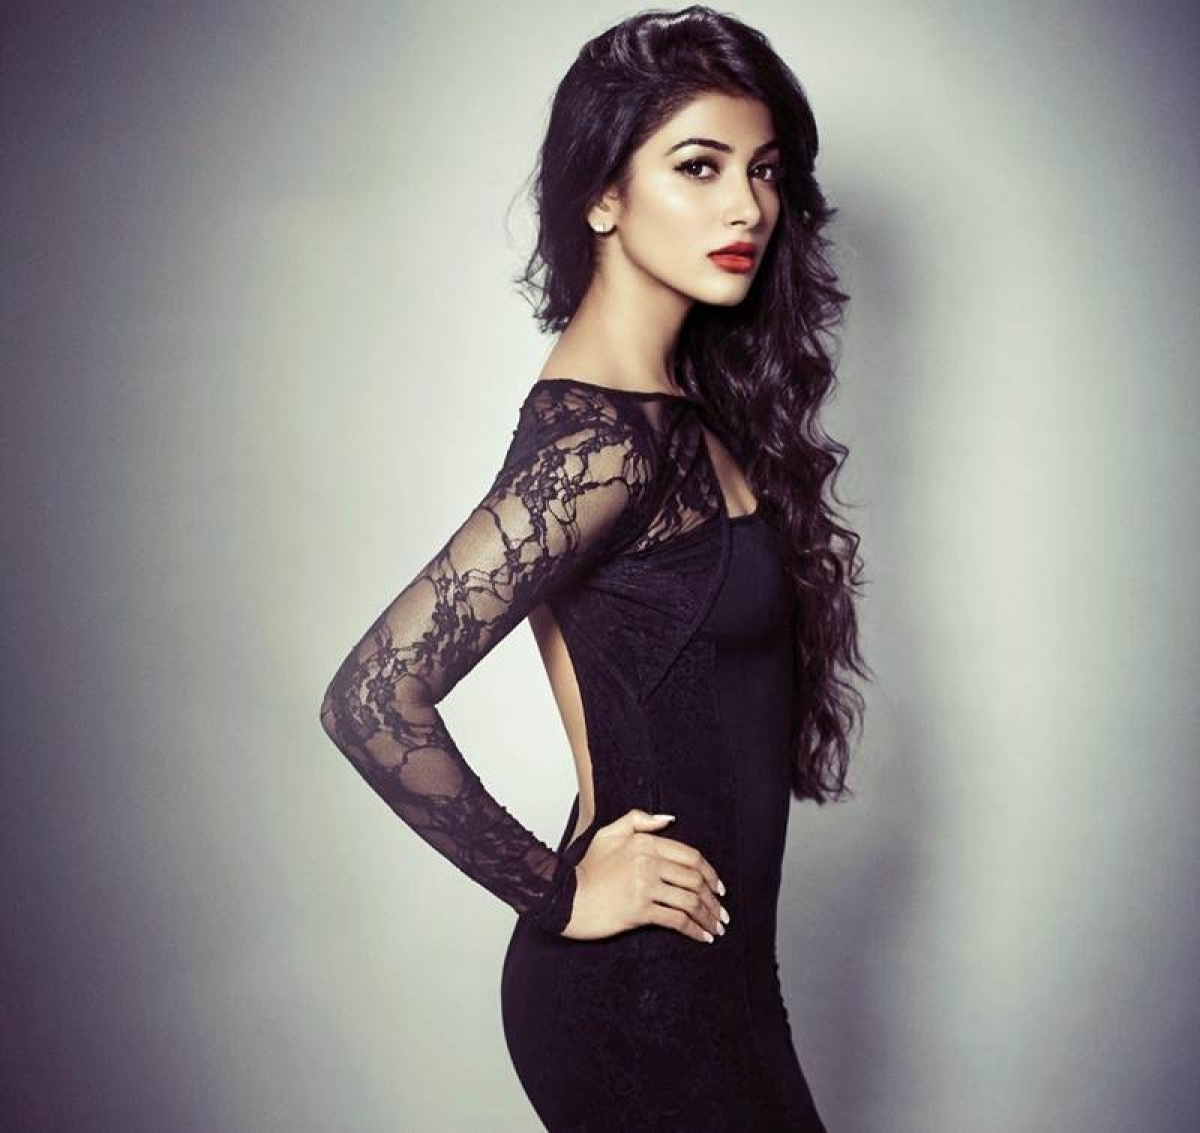 Pooja Hegde: Always wanted to work with Allu Arjun